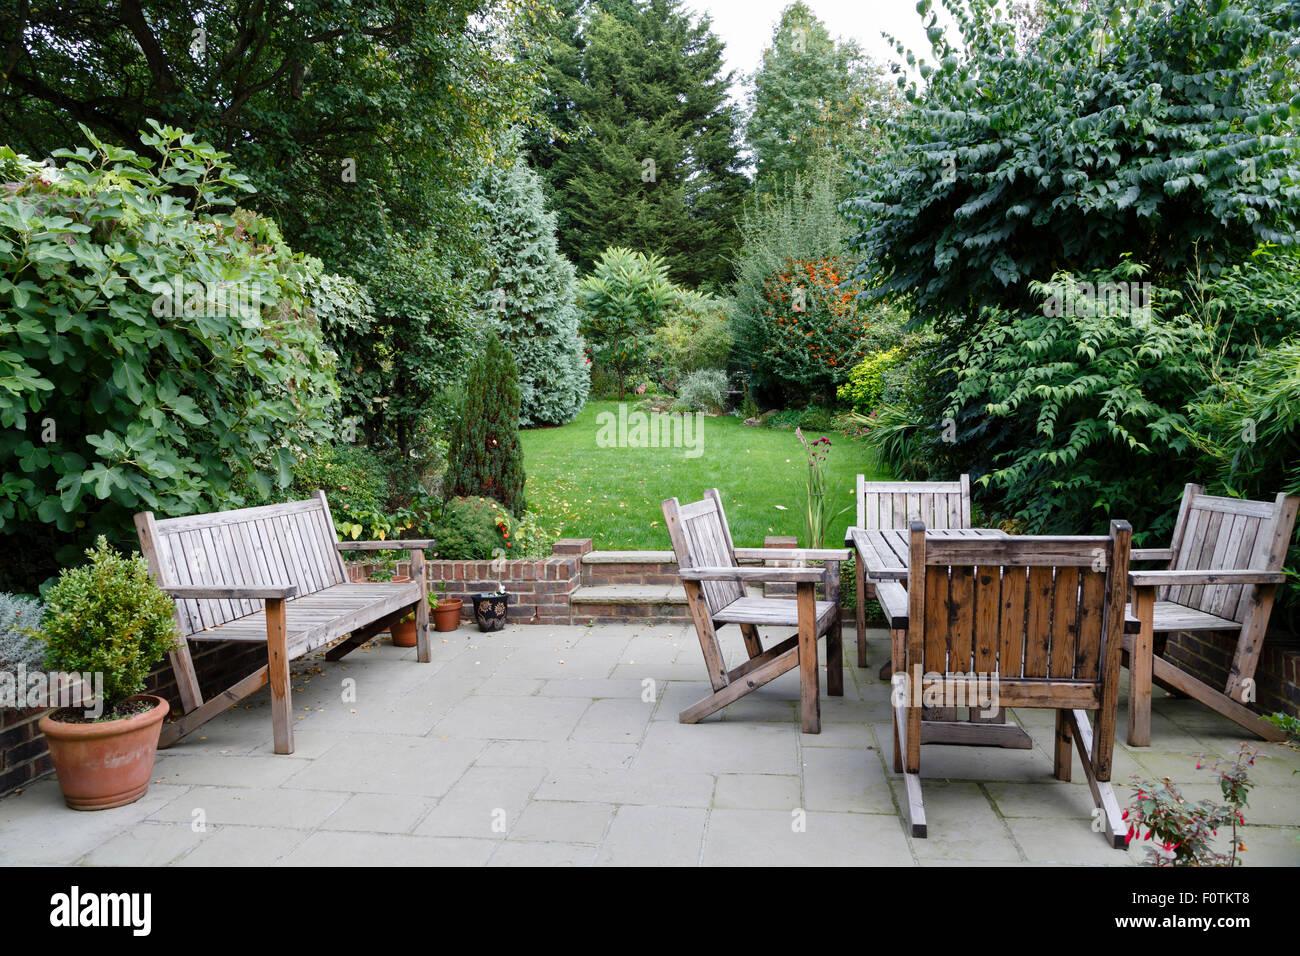 Jardin, terrasse et salon de jardin dans un anglais accueil Photo Stock